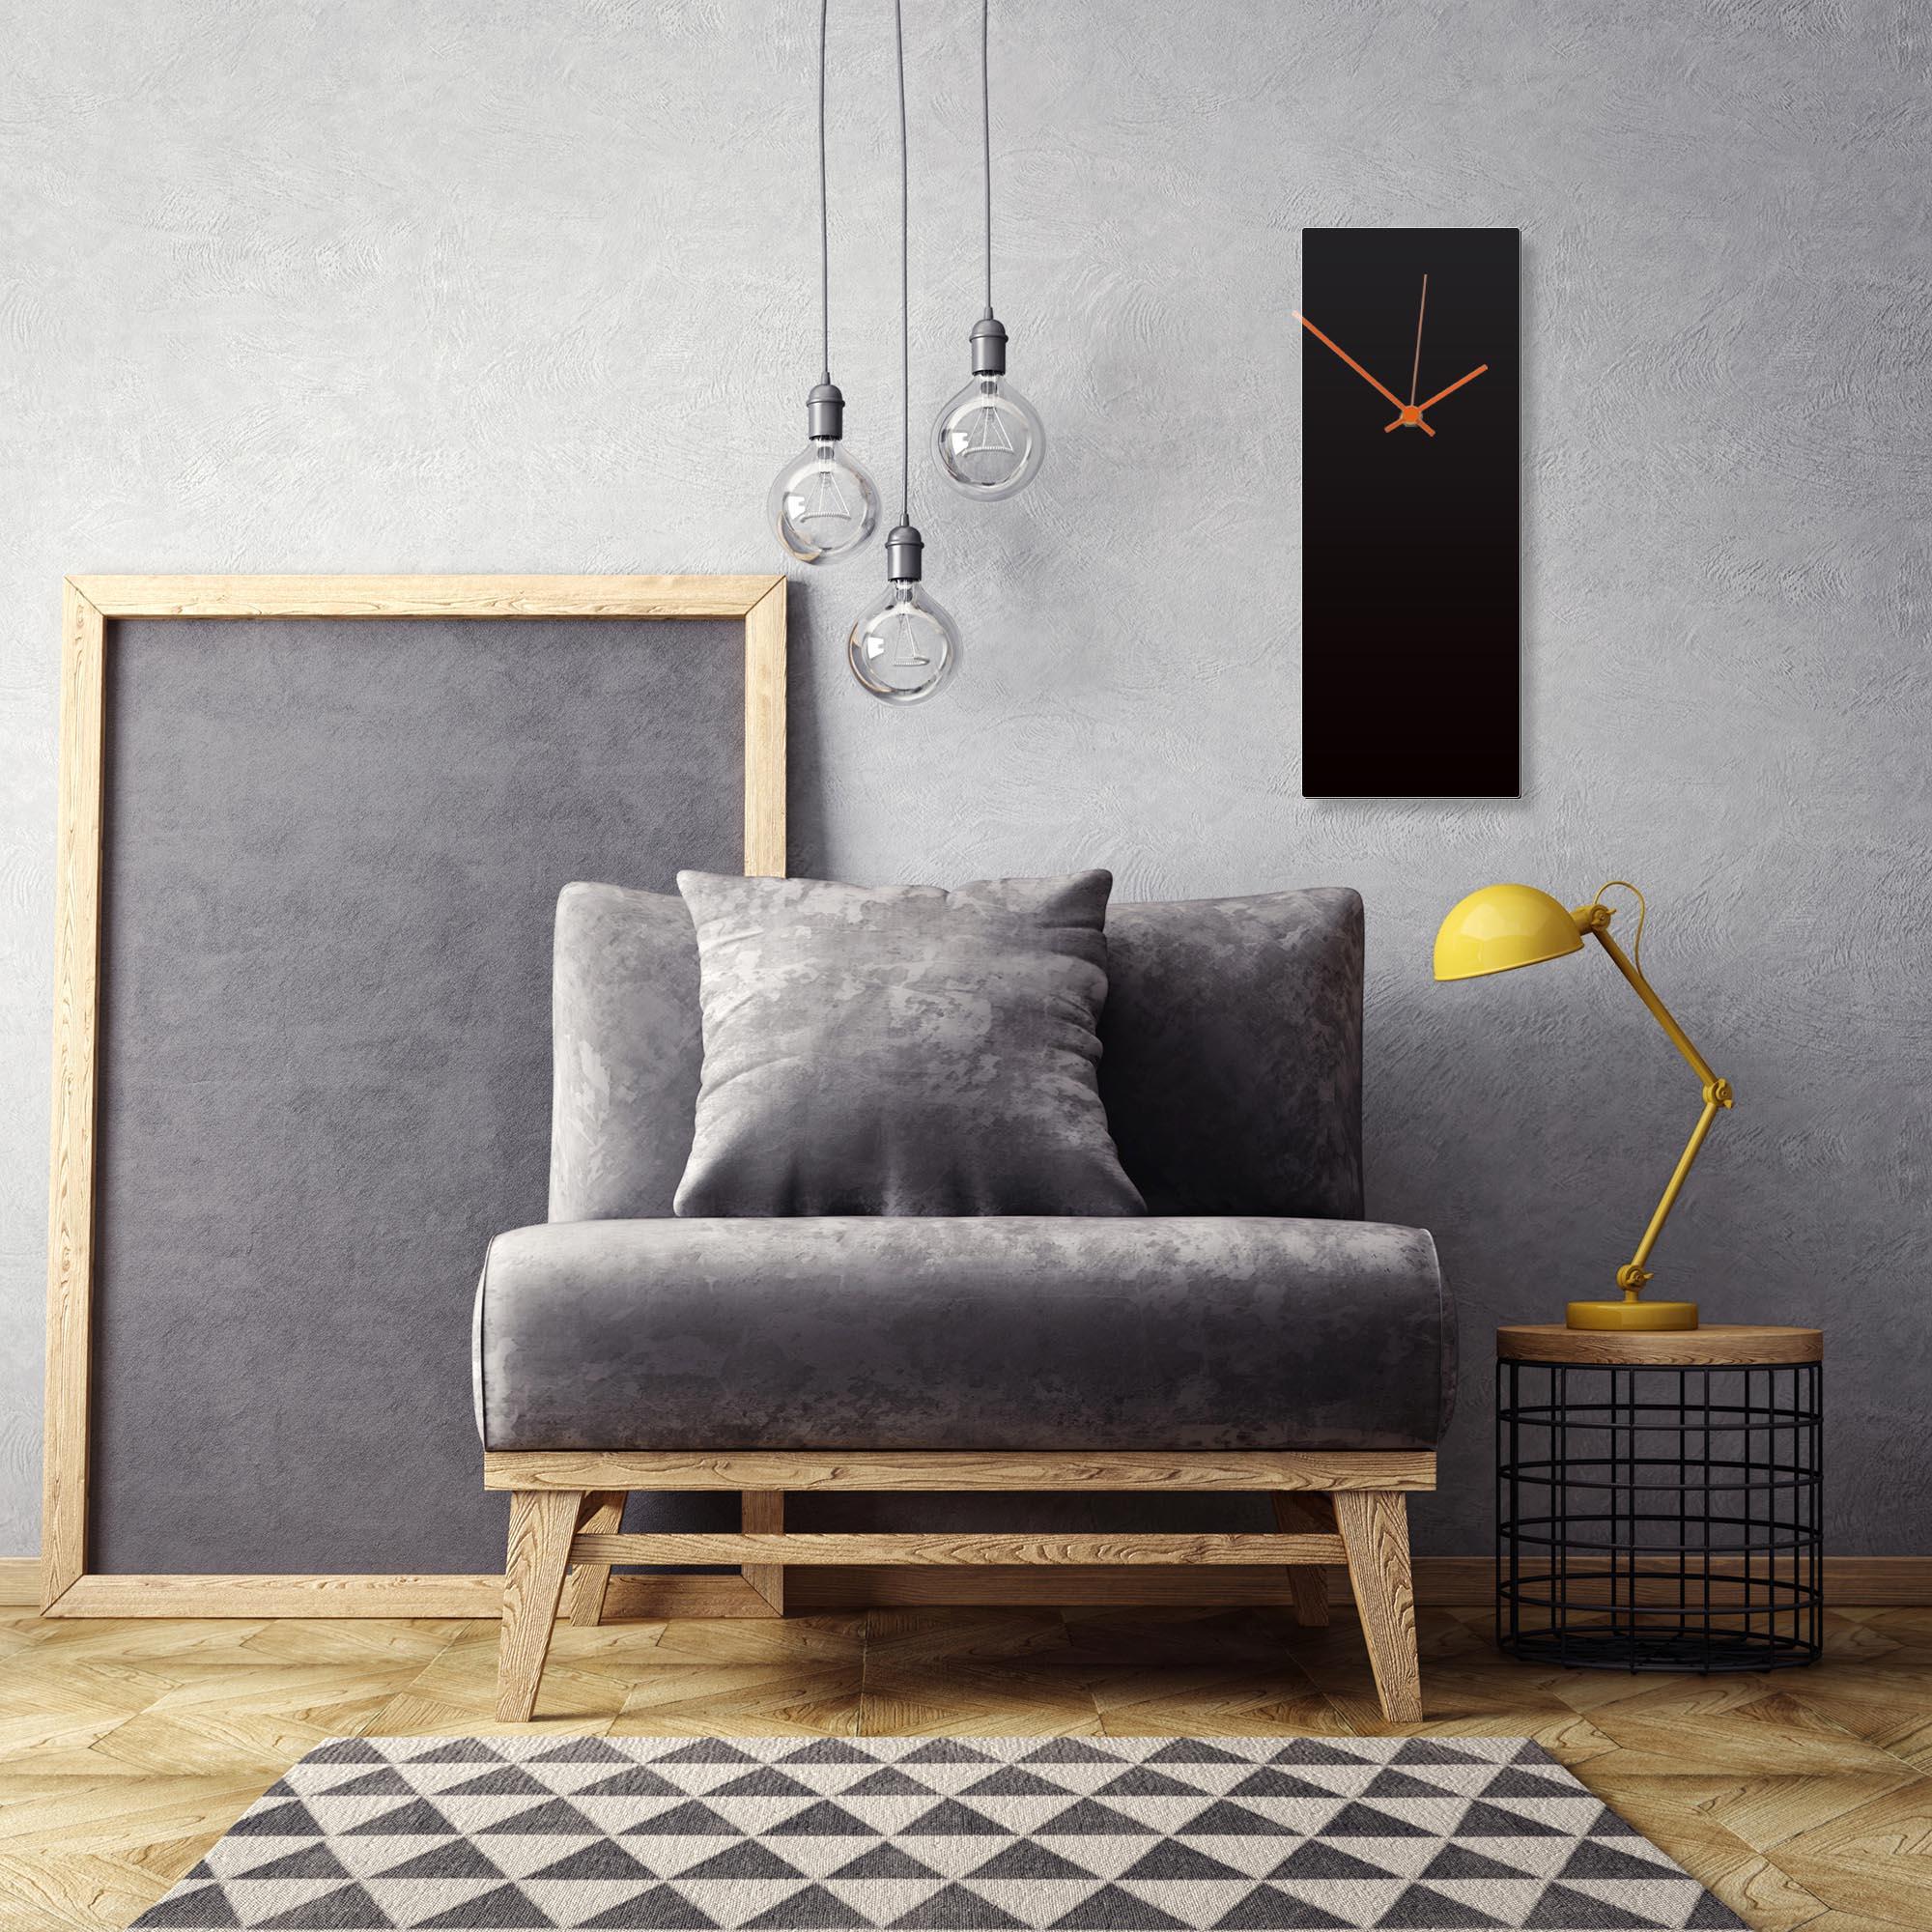 Blackout Orange Clock Large by Adam Schwoeppe Contemporary Clock on Aluminum Polymetal - Alternate View 1